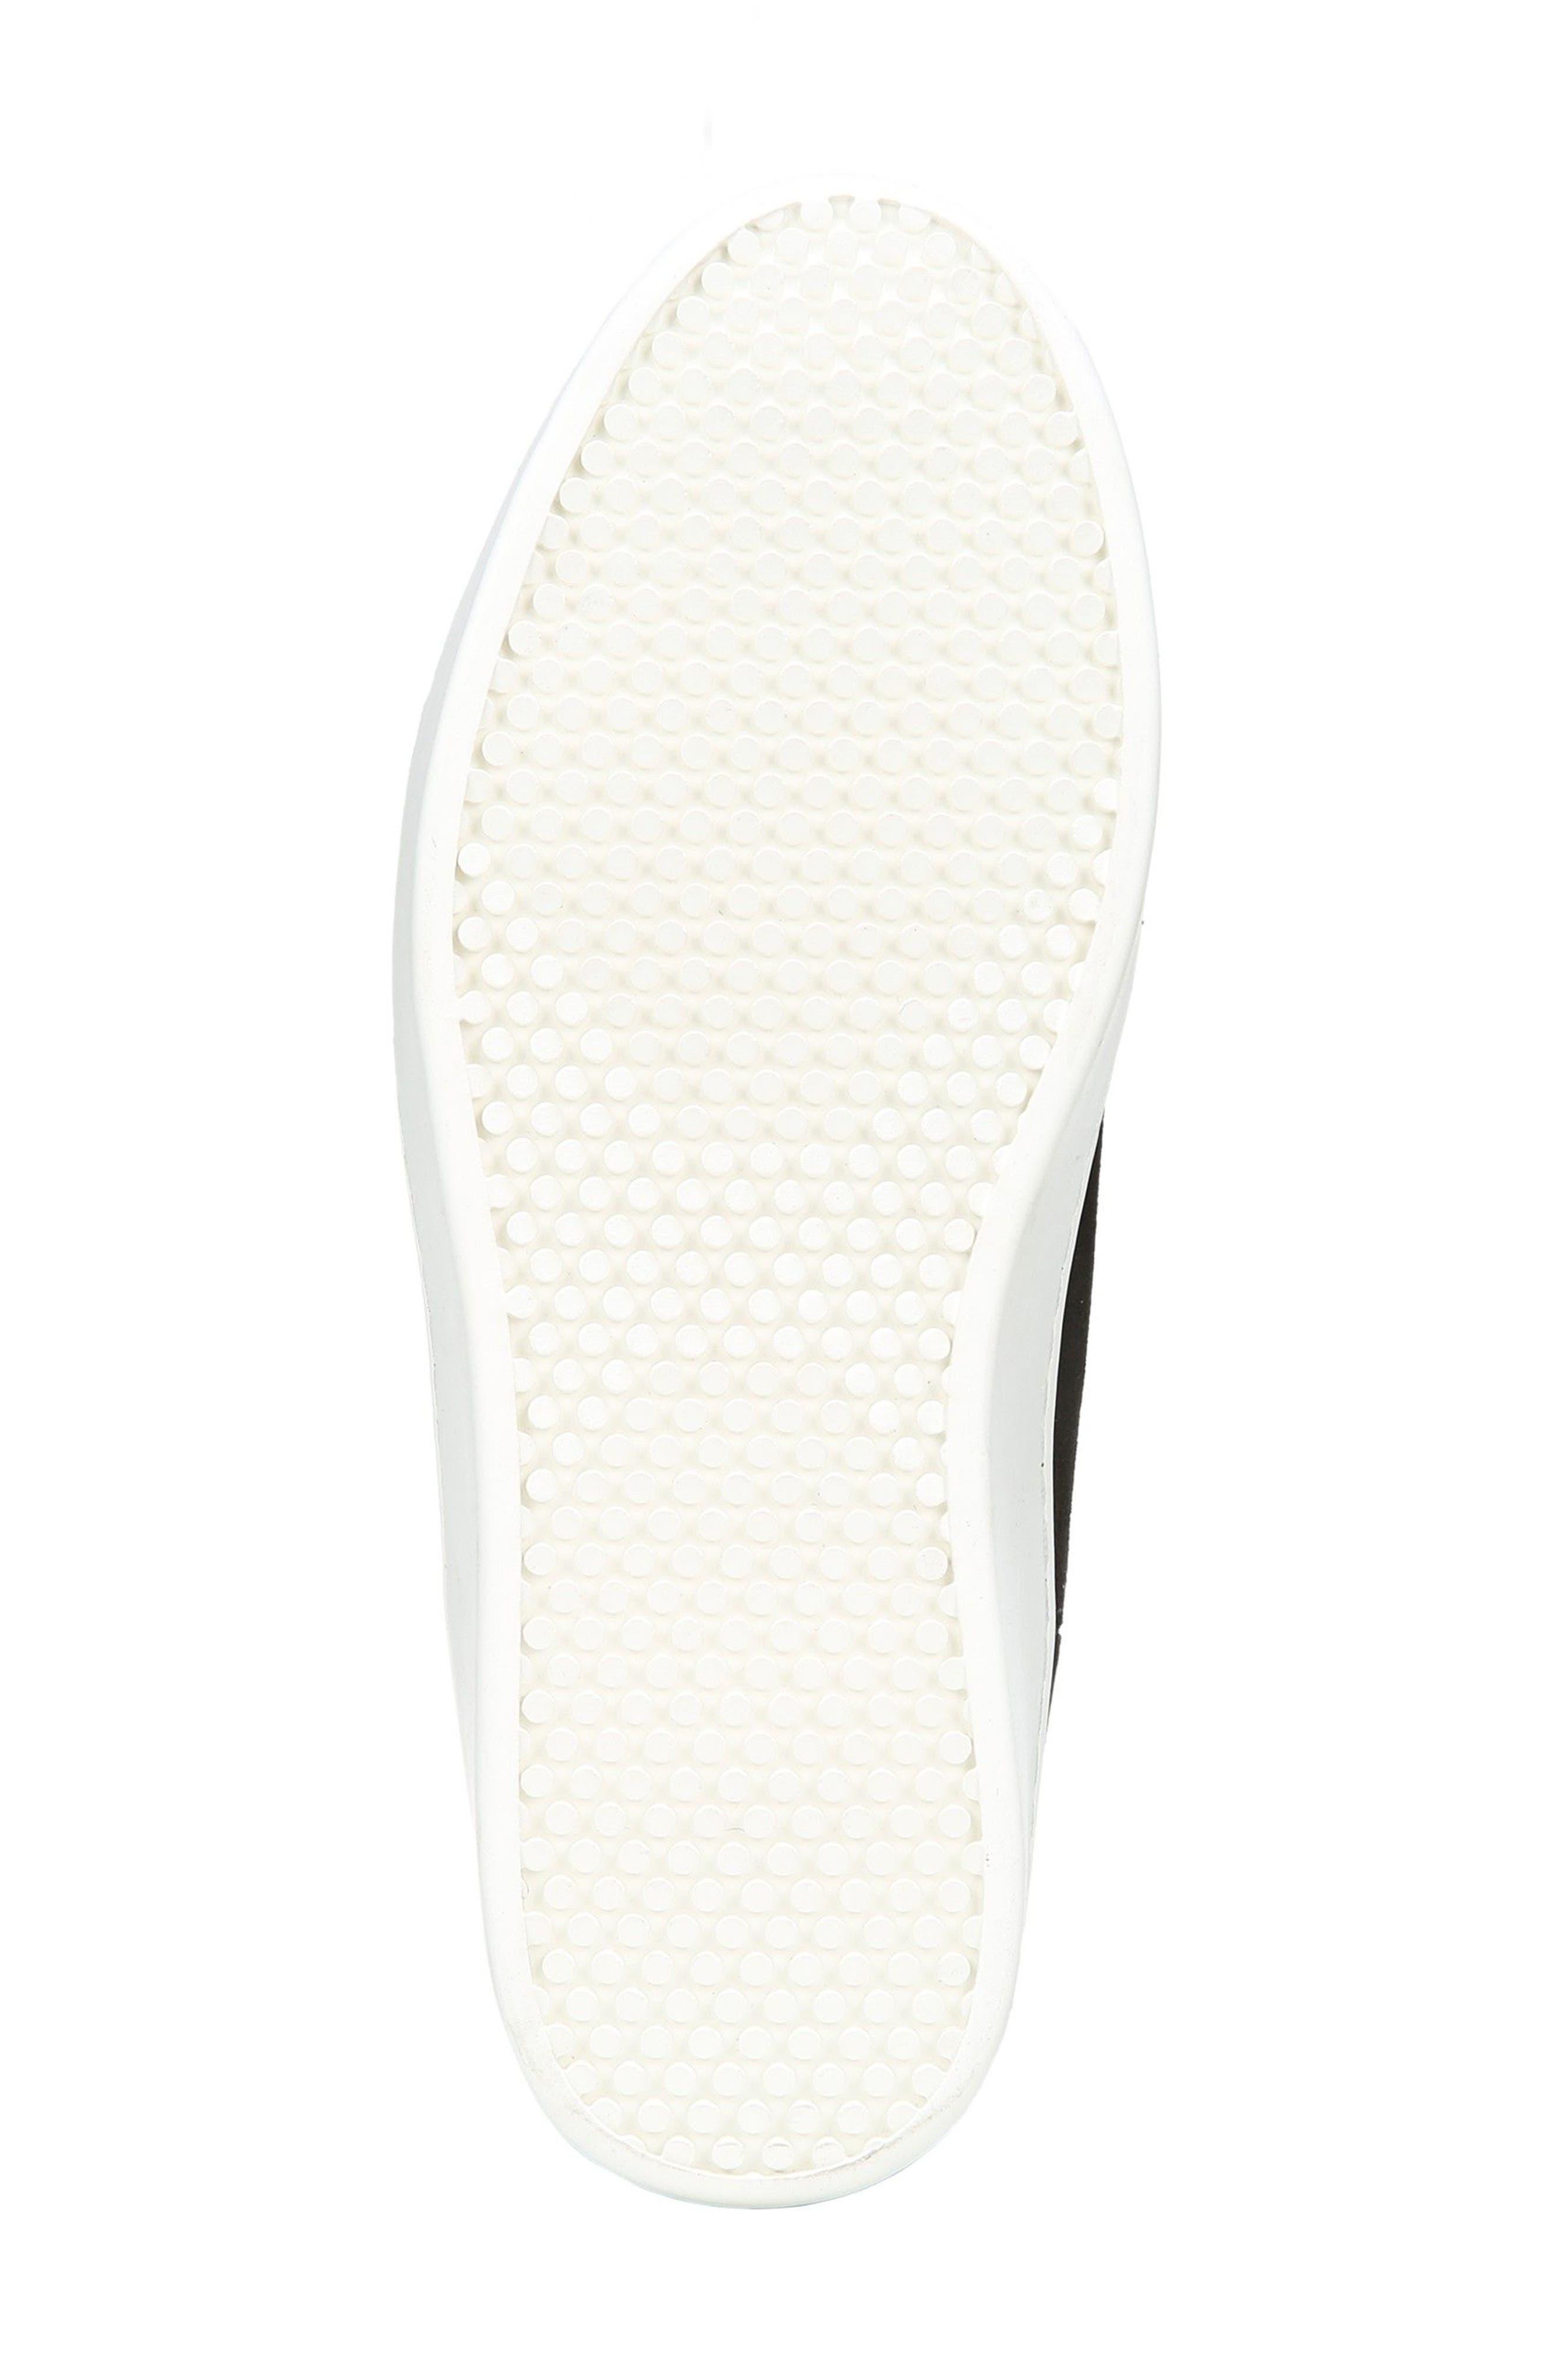 Elona Genuine Shearling Lined Sneaker Boot,                             Alternate thumbnail 6, color,                             001